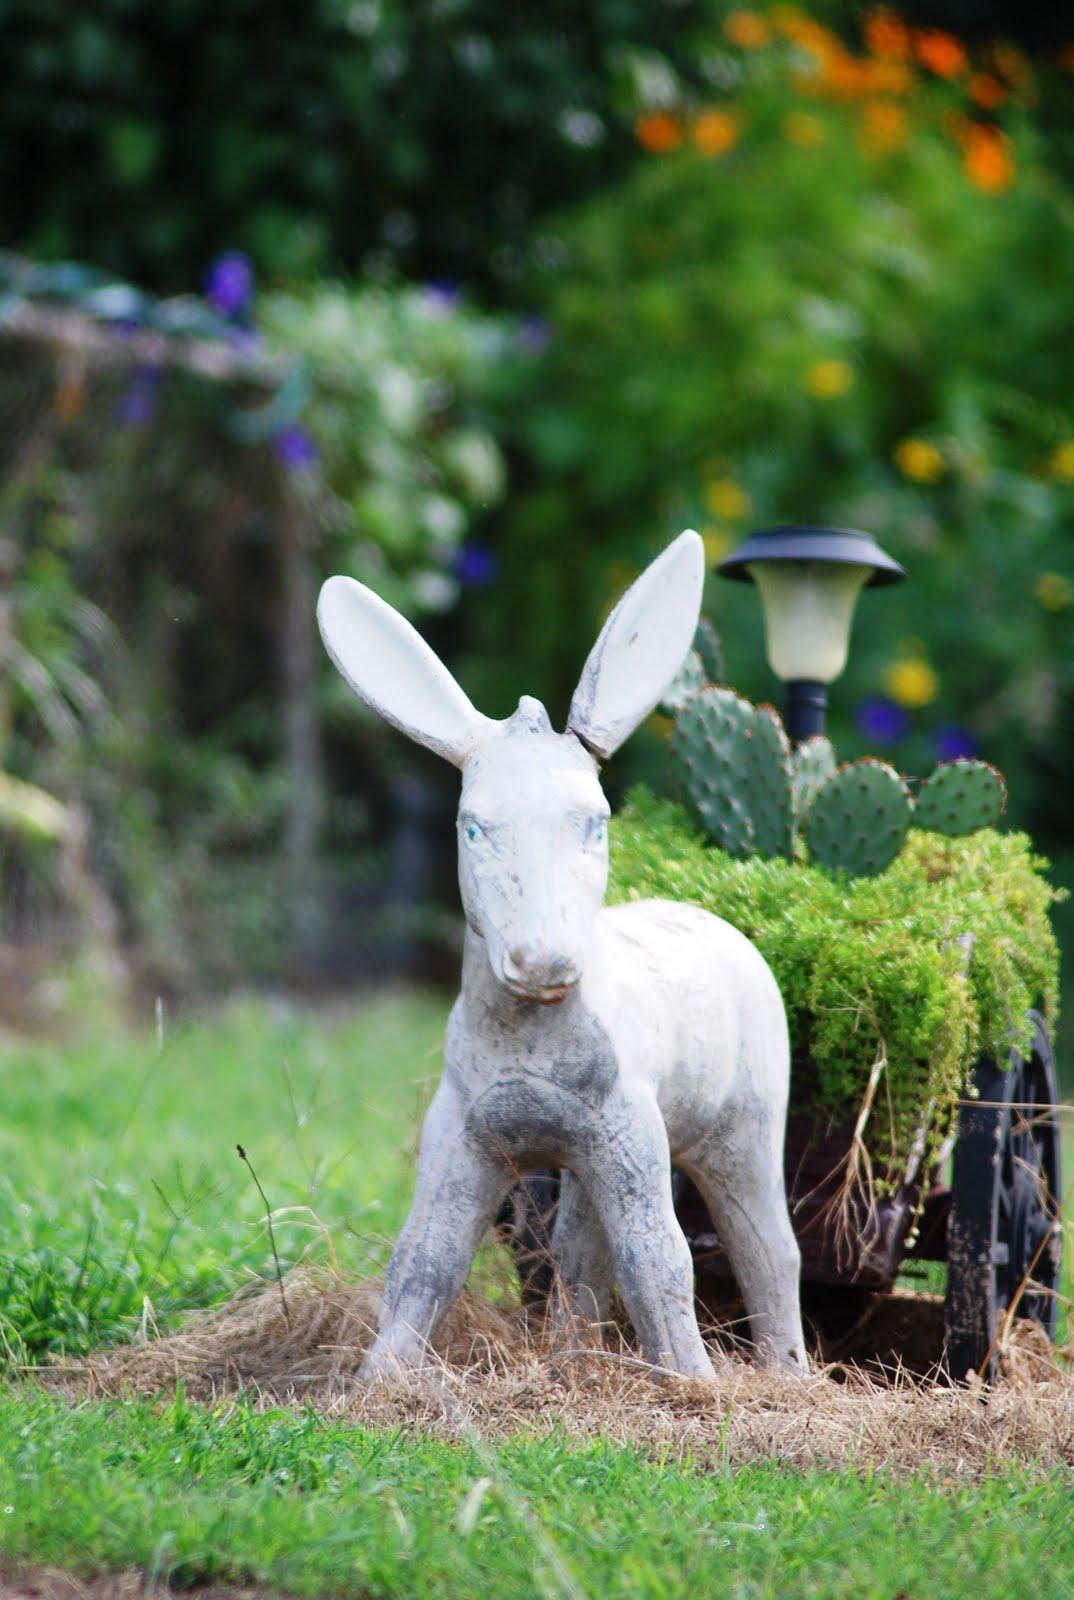 Donkey ornaments - Another Donkey Lawn Ornament